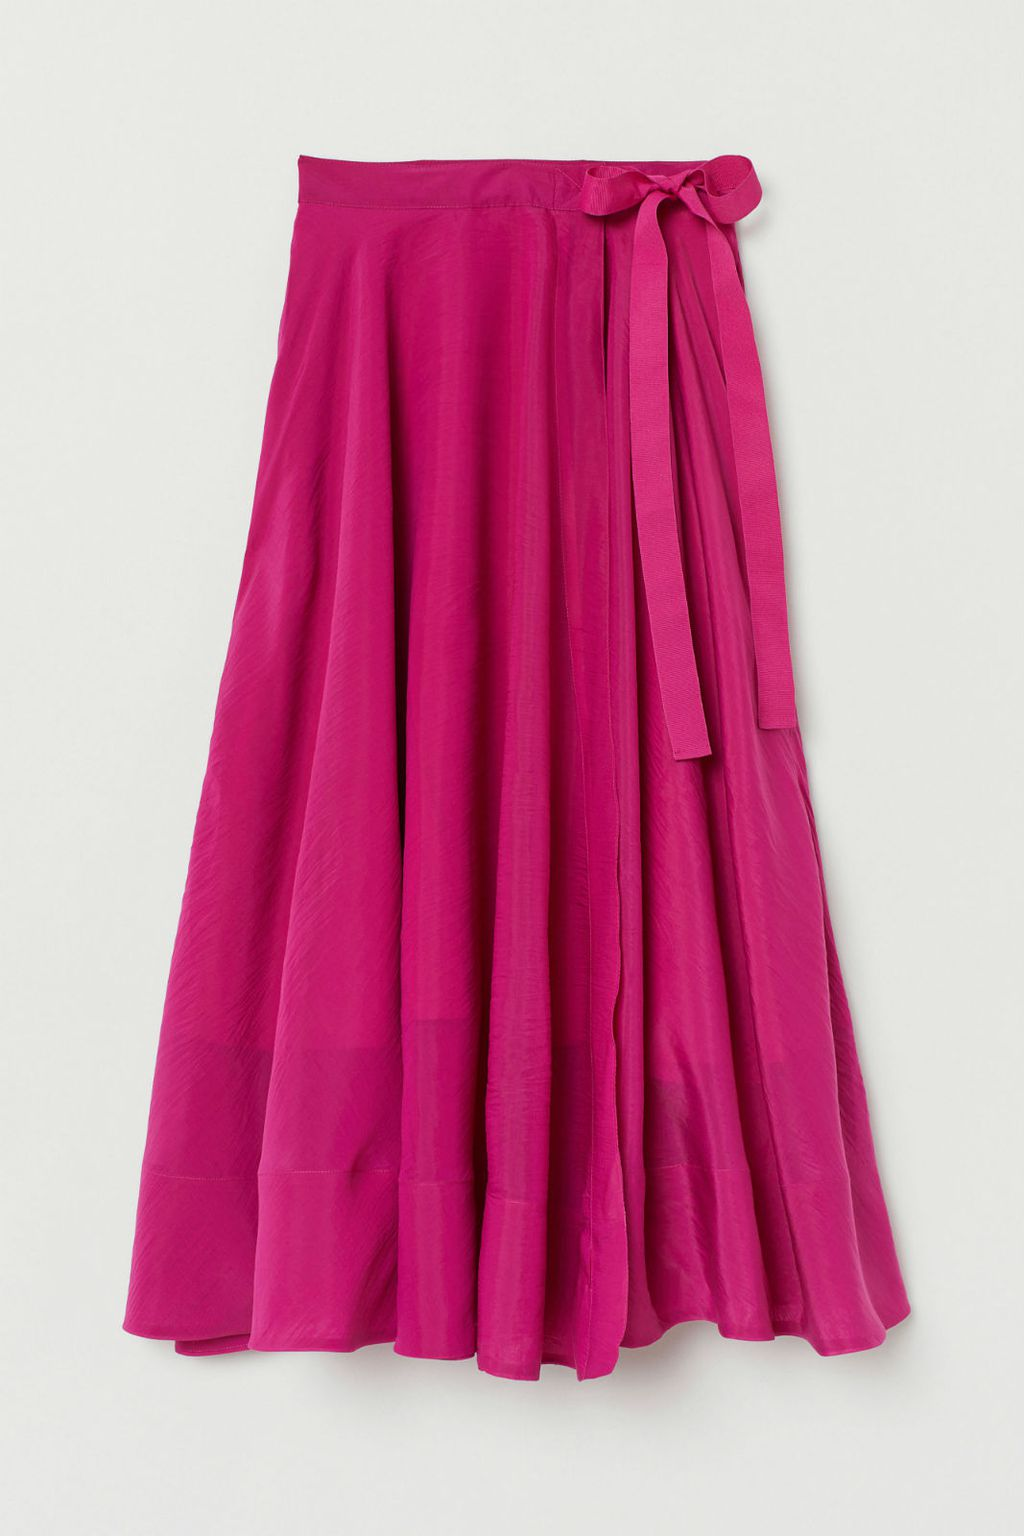 H&M midi suknja, 59,99 eura (443, 21 kn)